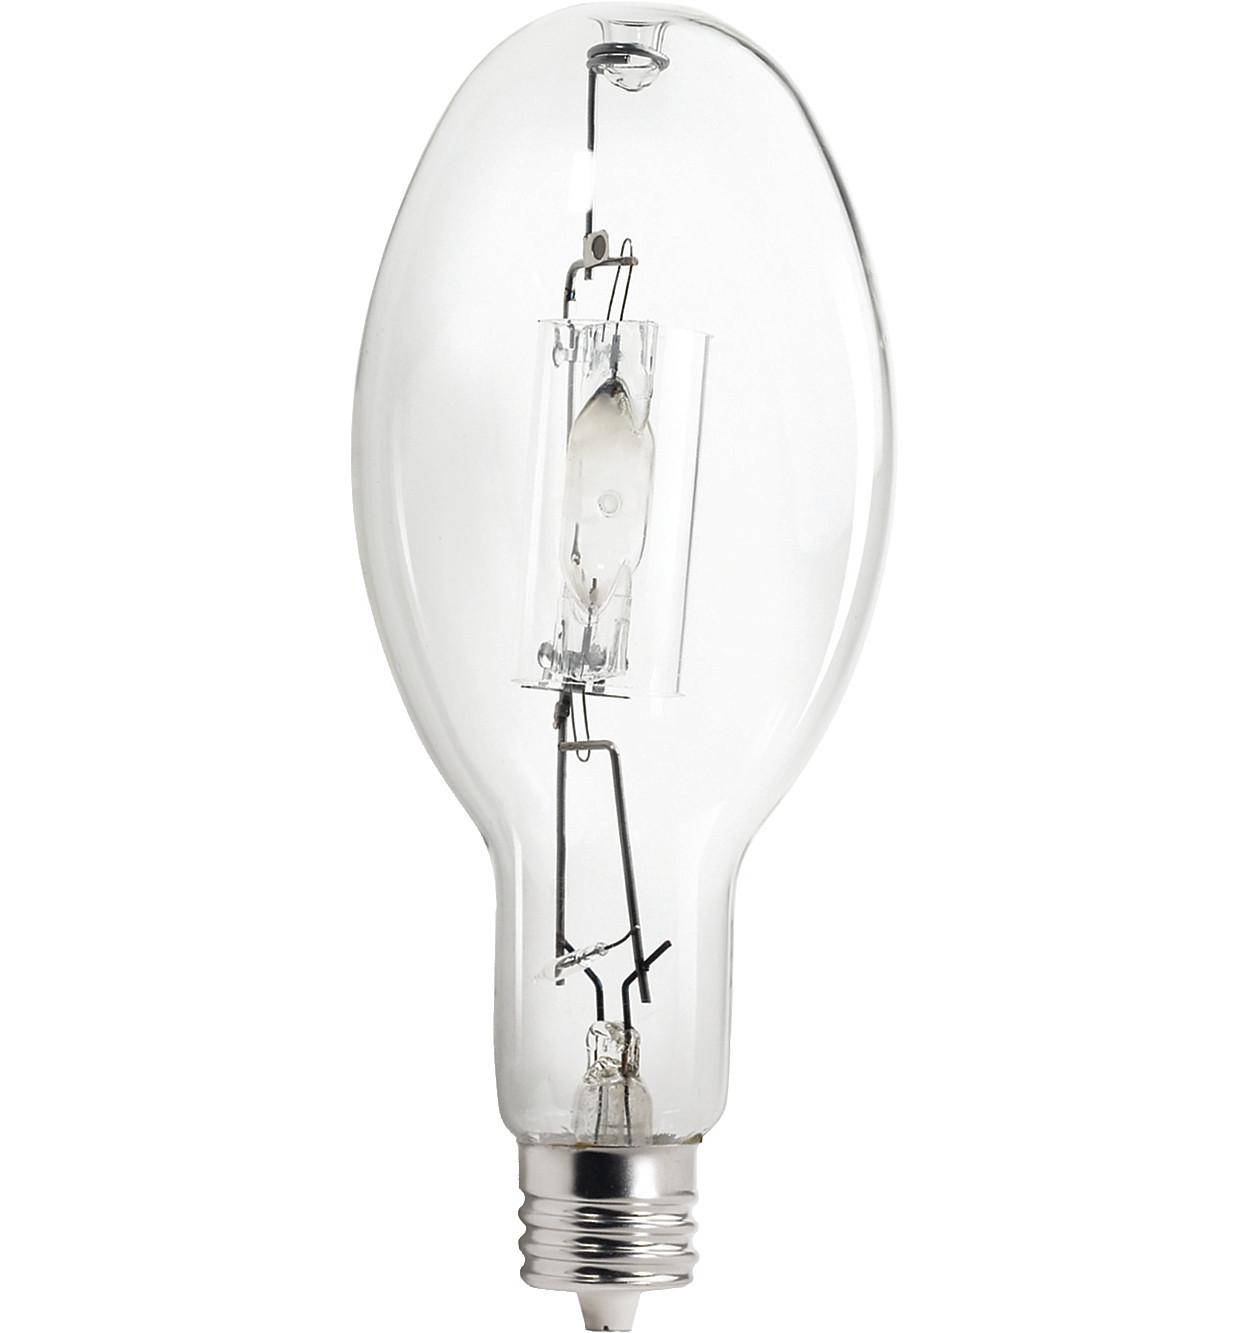 Metal Halide Lamp Intensity: 500 Internal Server Error